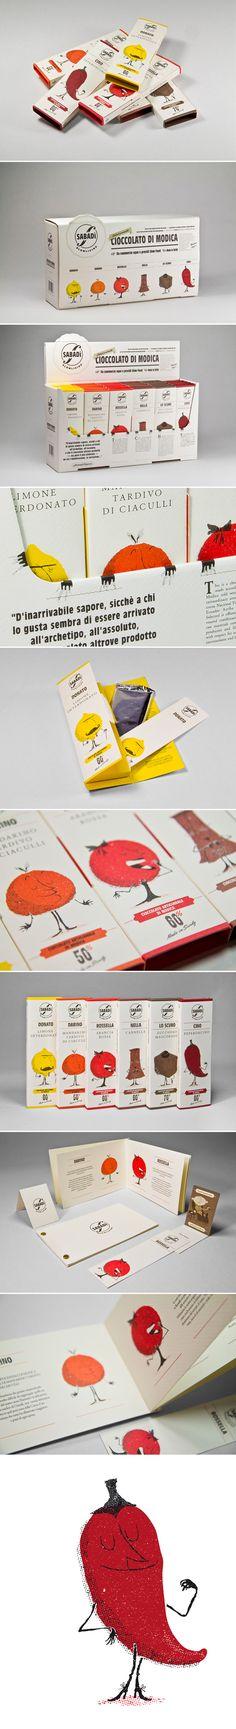 Chocolat Sabadi / designed by Happycentro. #packaging